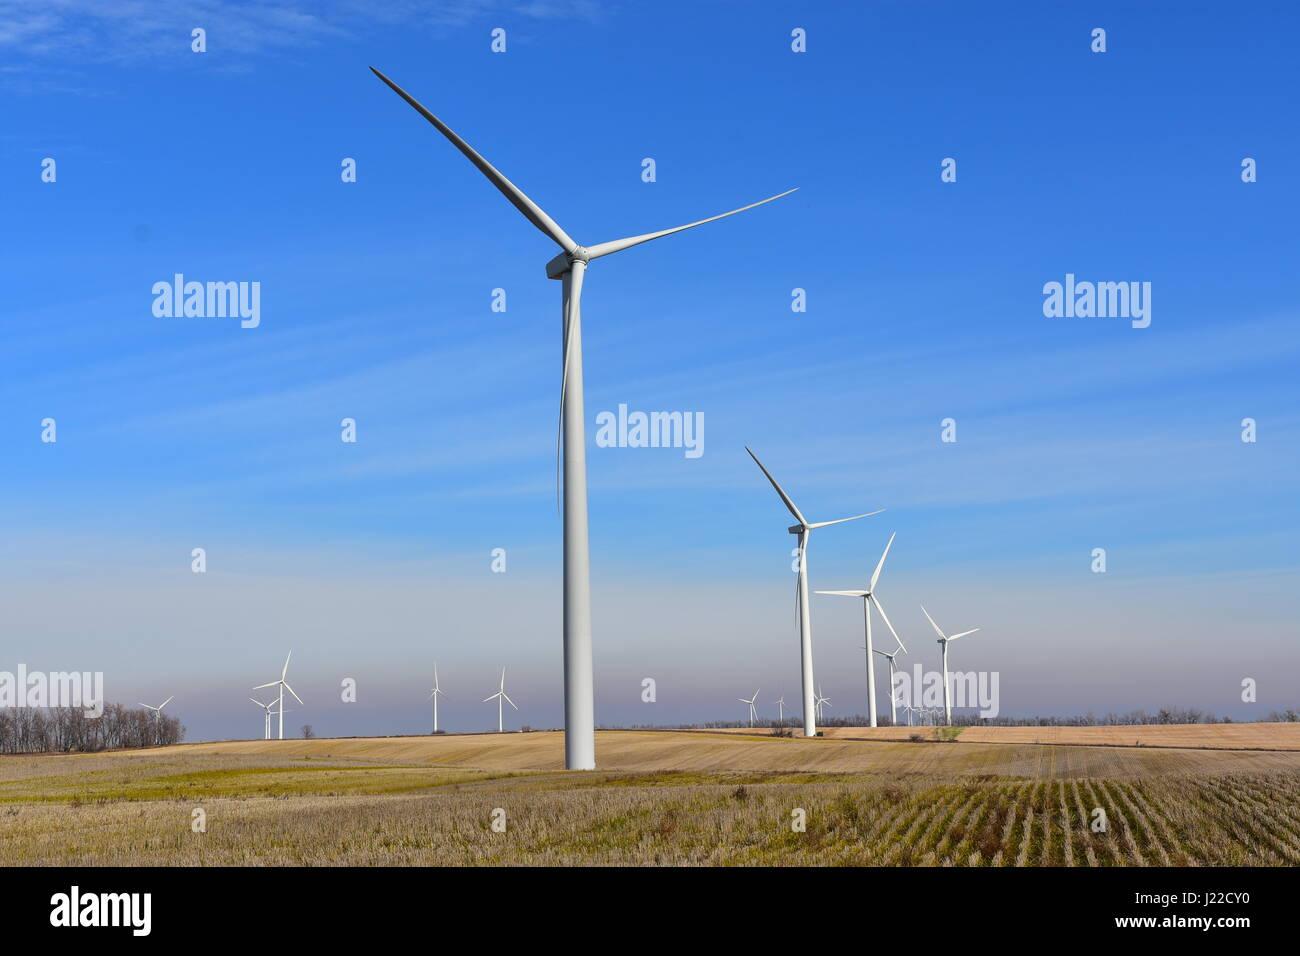 Wind turbines generating clean renewable energy. - Stock Image